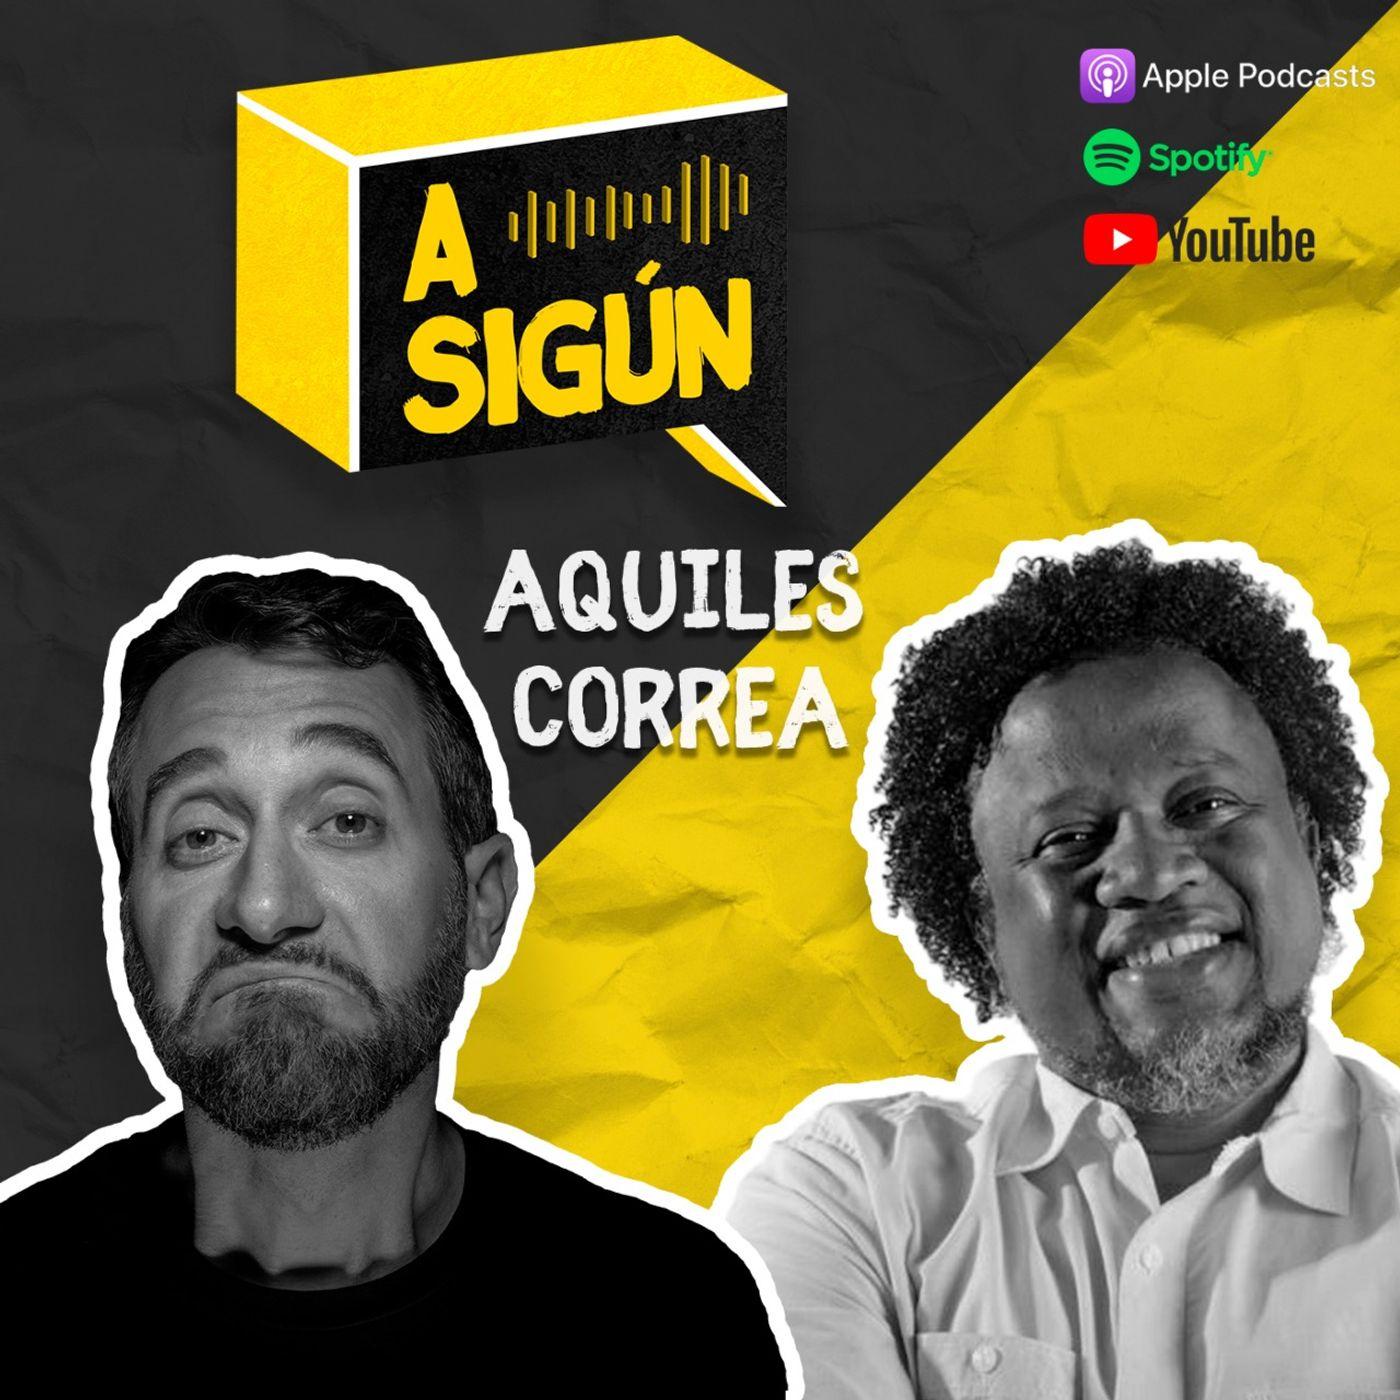 017. A SIGÚN: Aquiles Correa